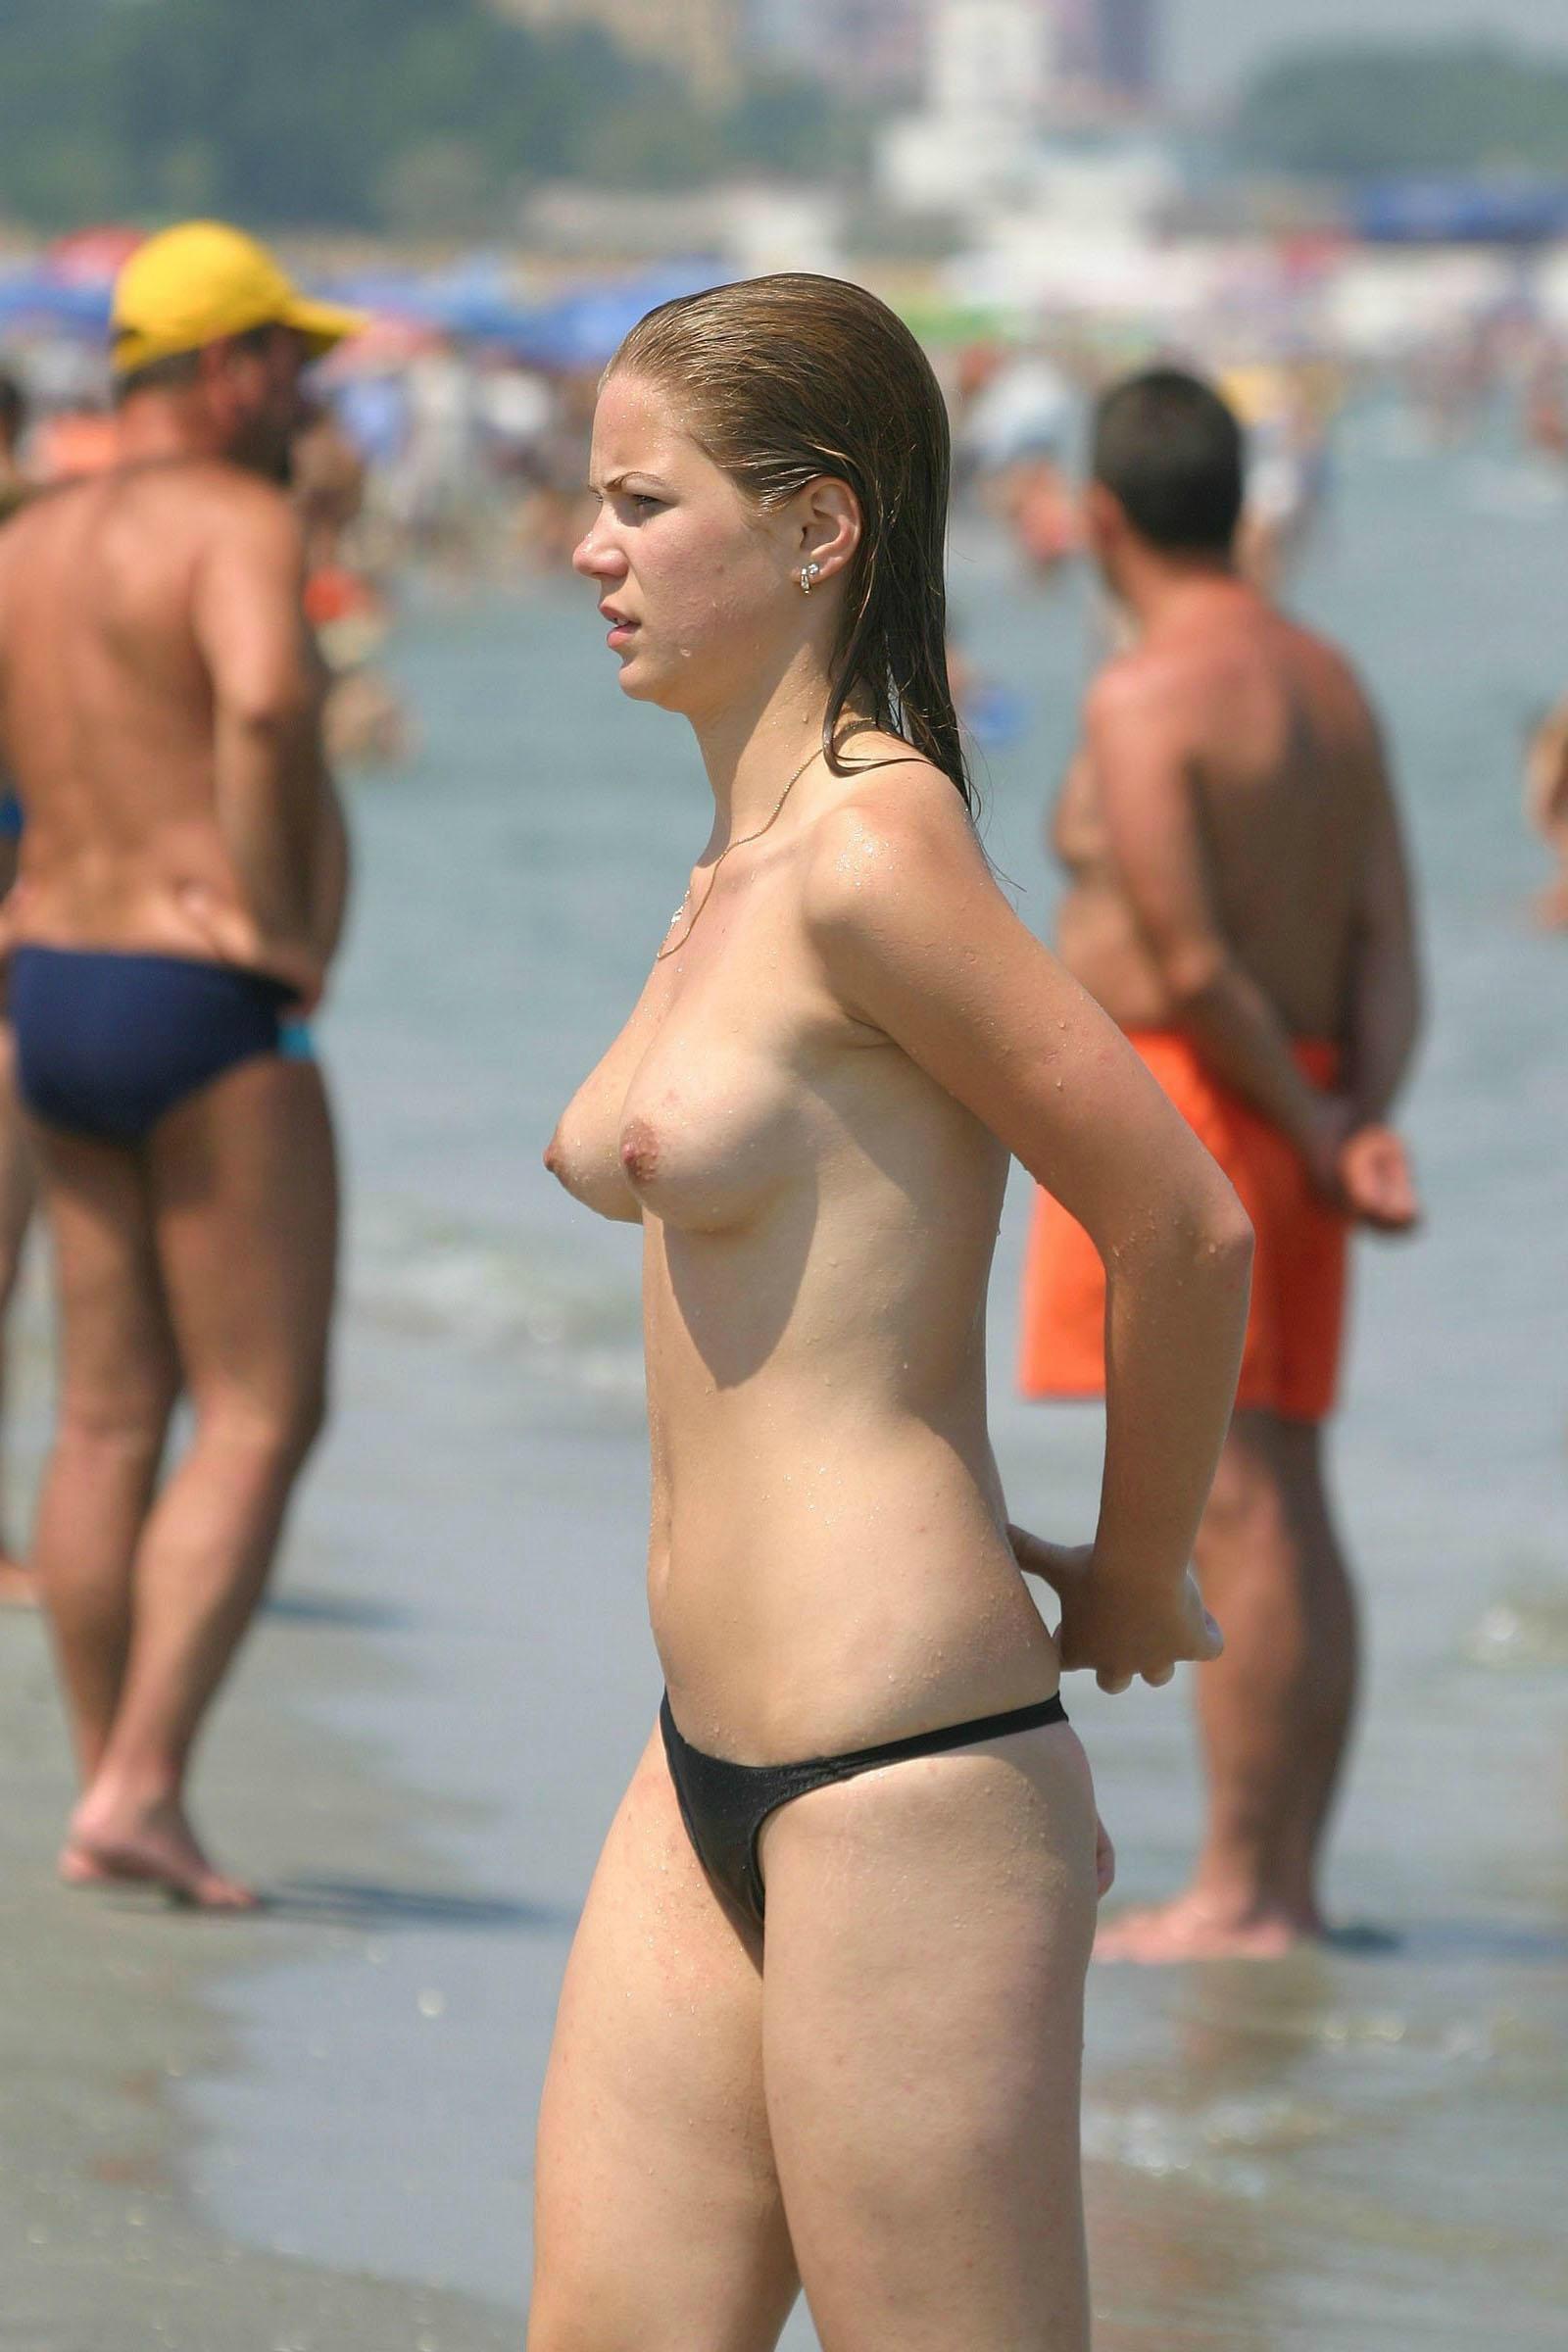 Topless hottie nude on a public beach